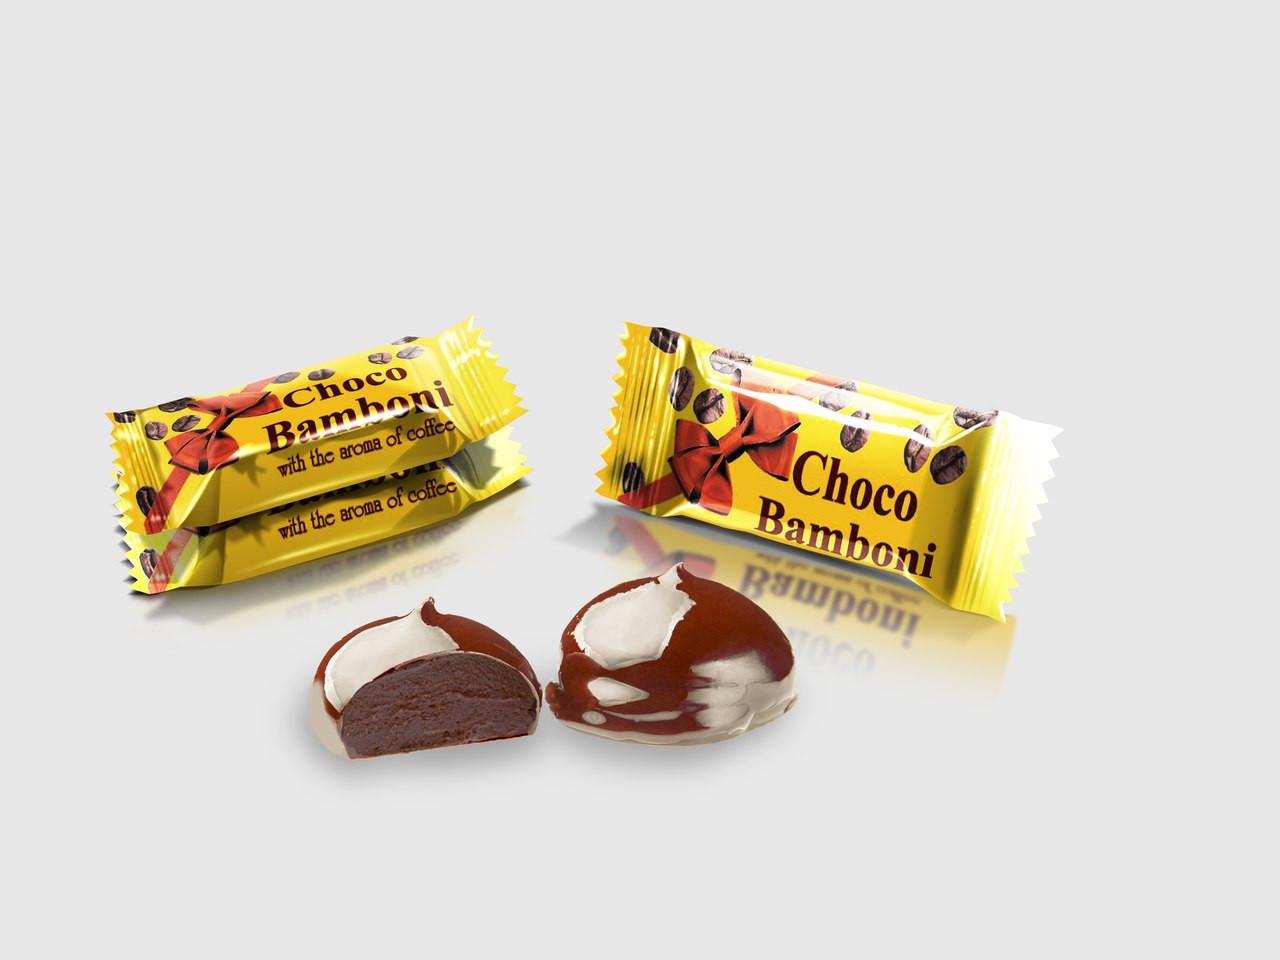 Цукерки Шоко бомбони з ароматом кави 2,5 кг. ТМ Суворов